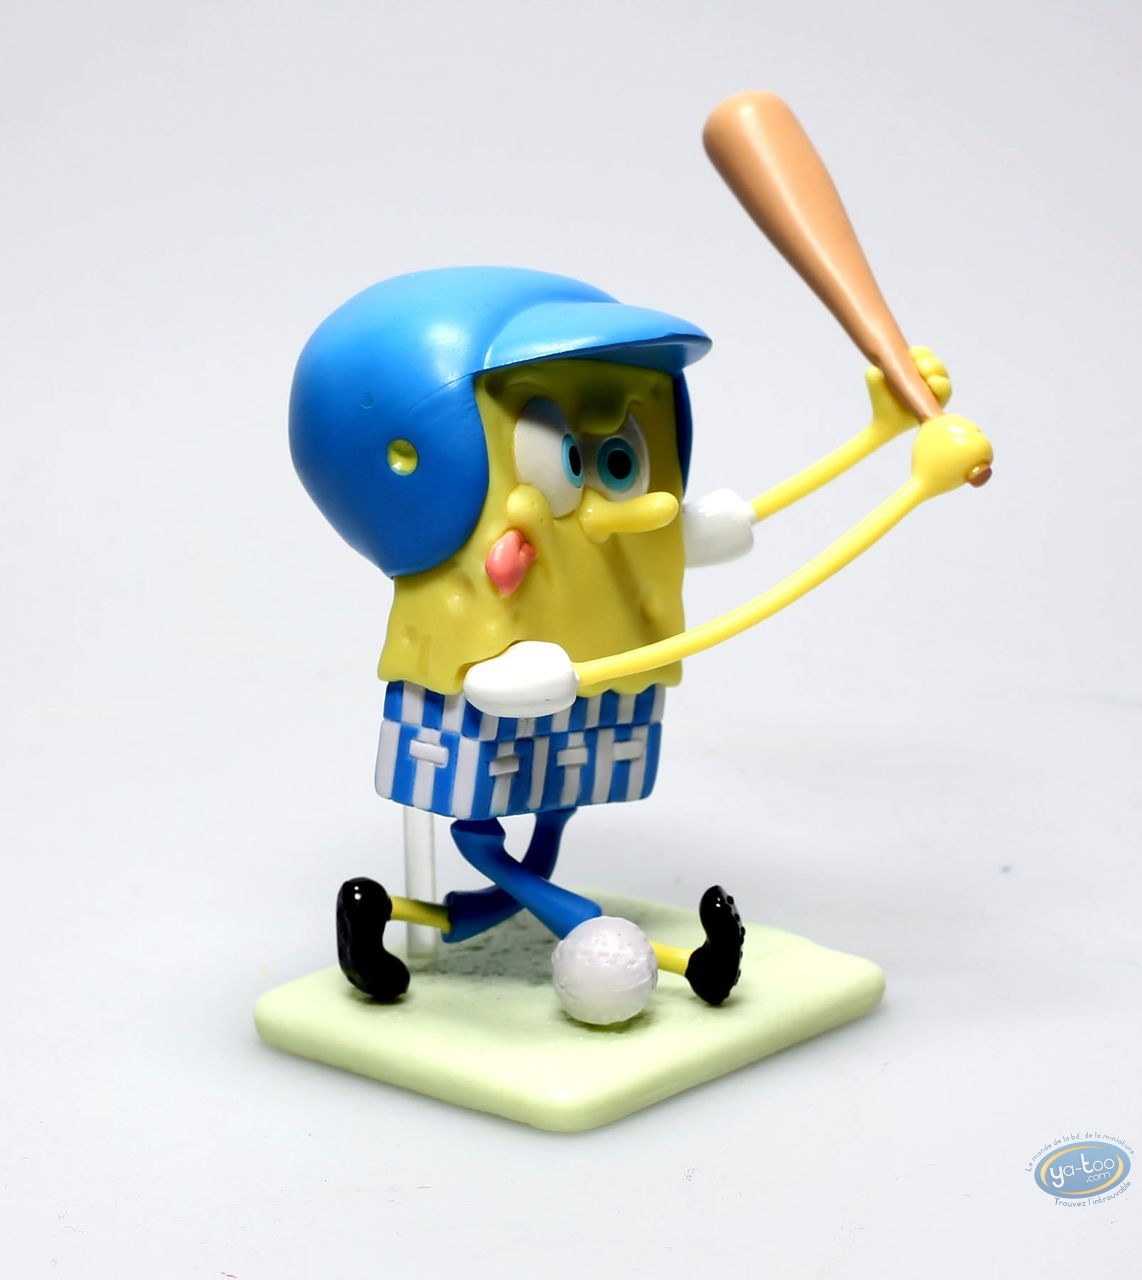 Figurine plastique, Bob l'Eponge : Bob l'éponge Base-ball